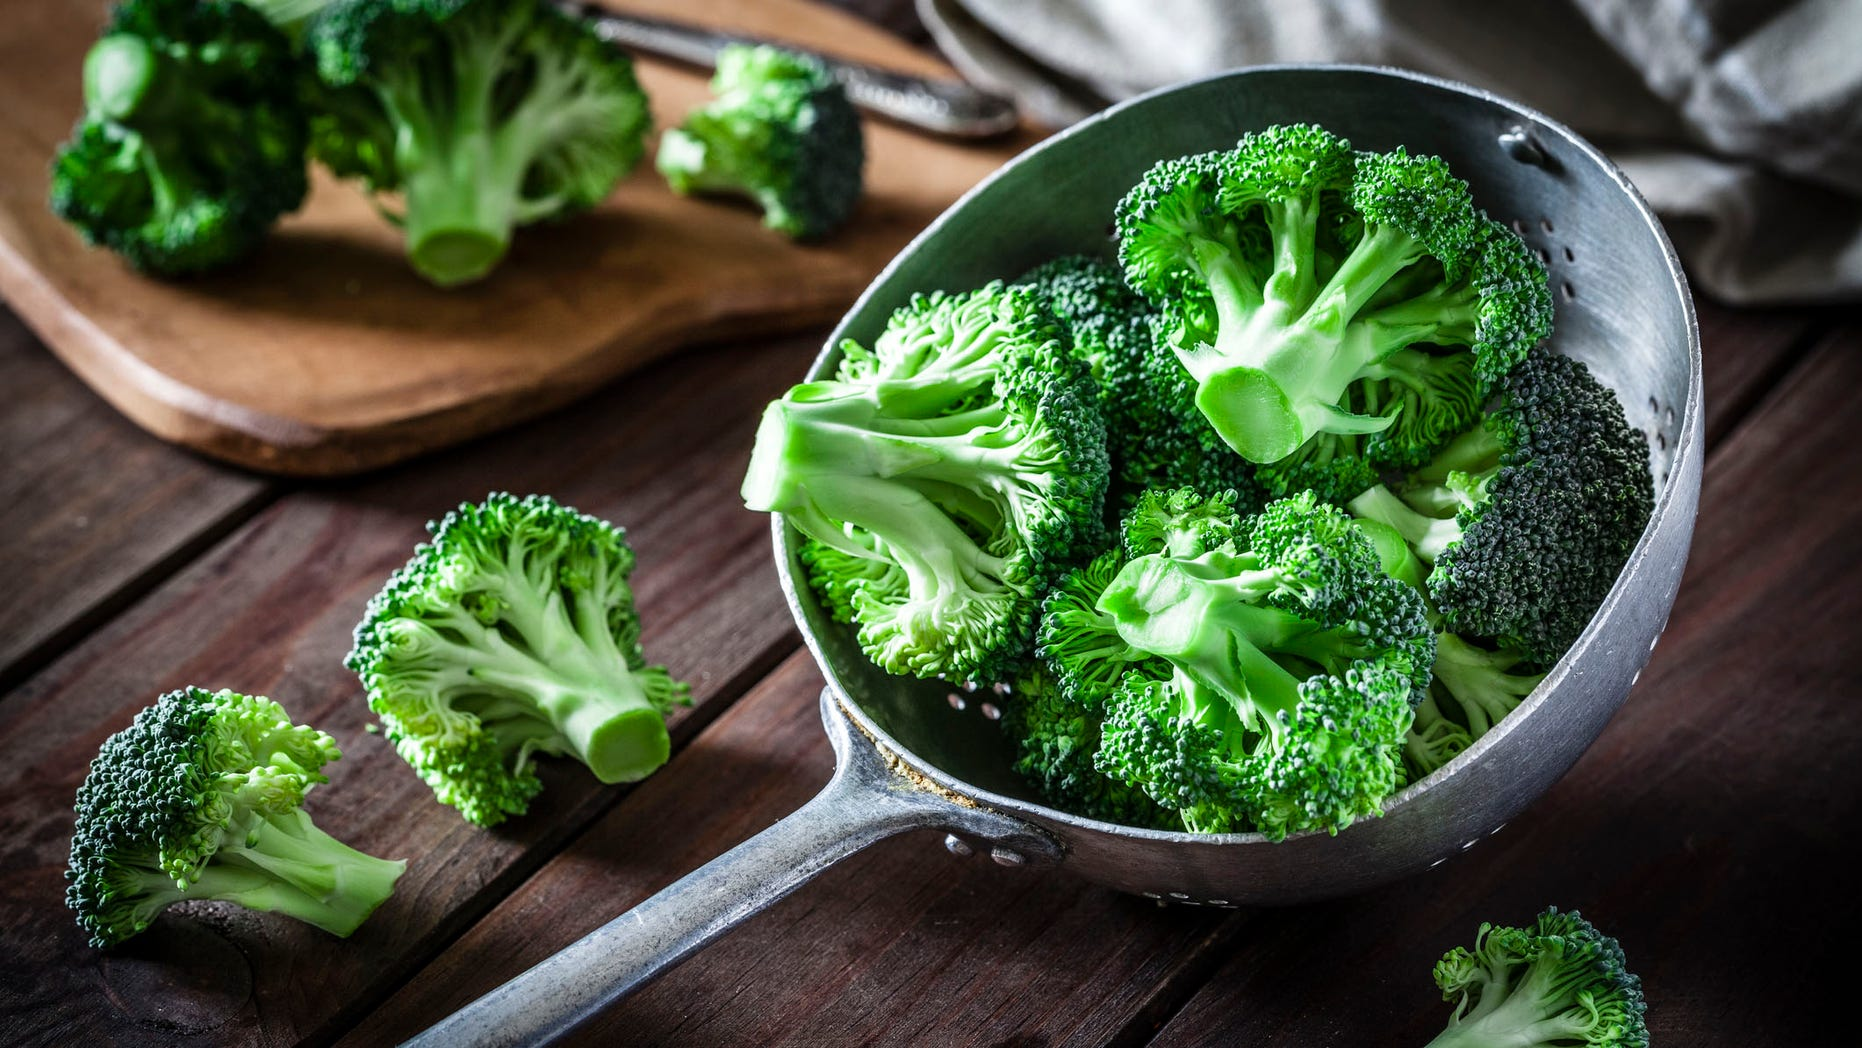 Broccoli may help fight schizophrenia